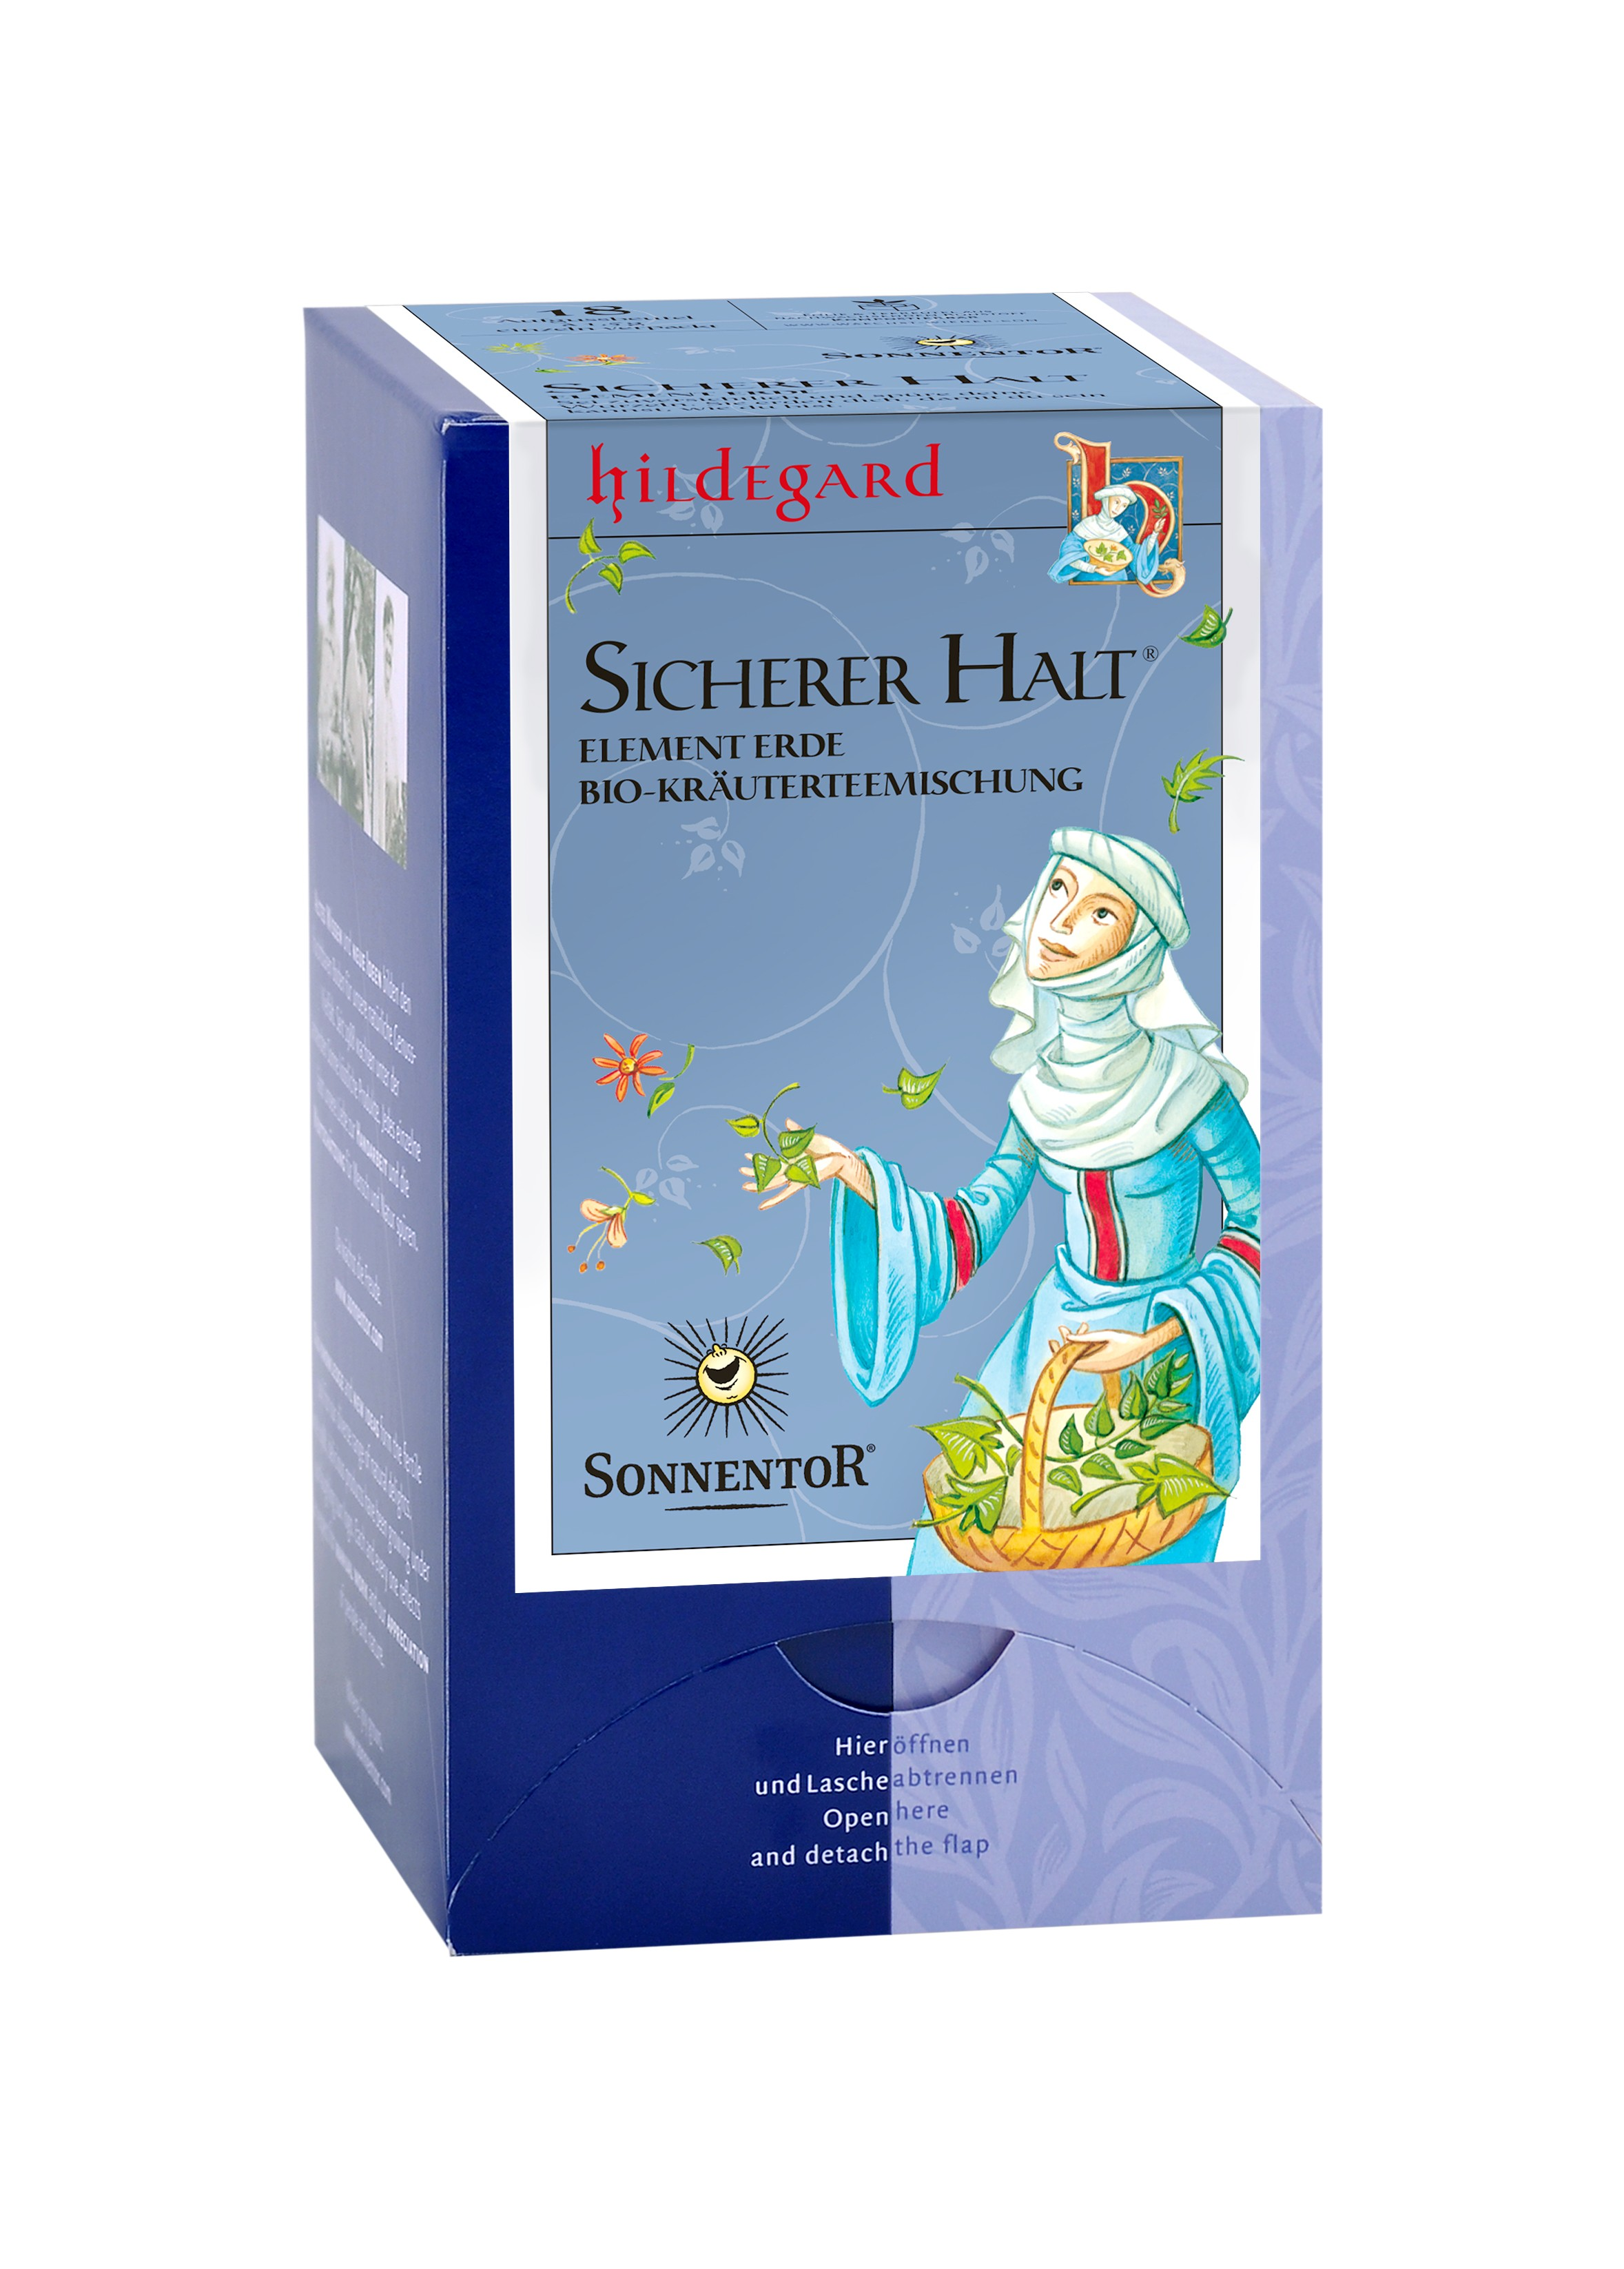 Sicherer Halt Hildegard 4 Elemente (Erde) Tee Beutel